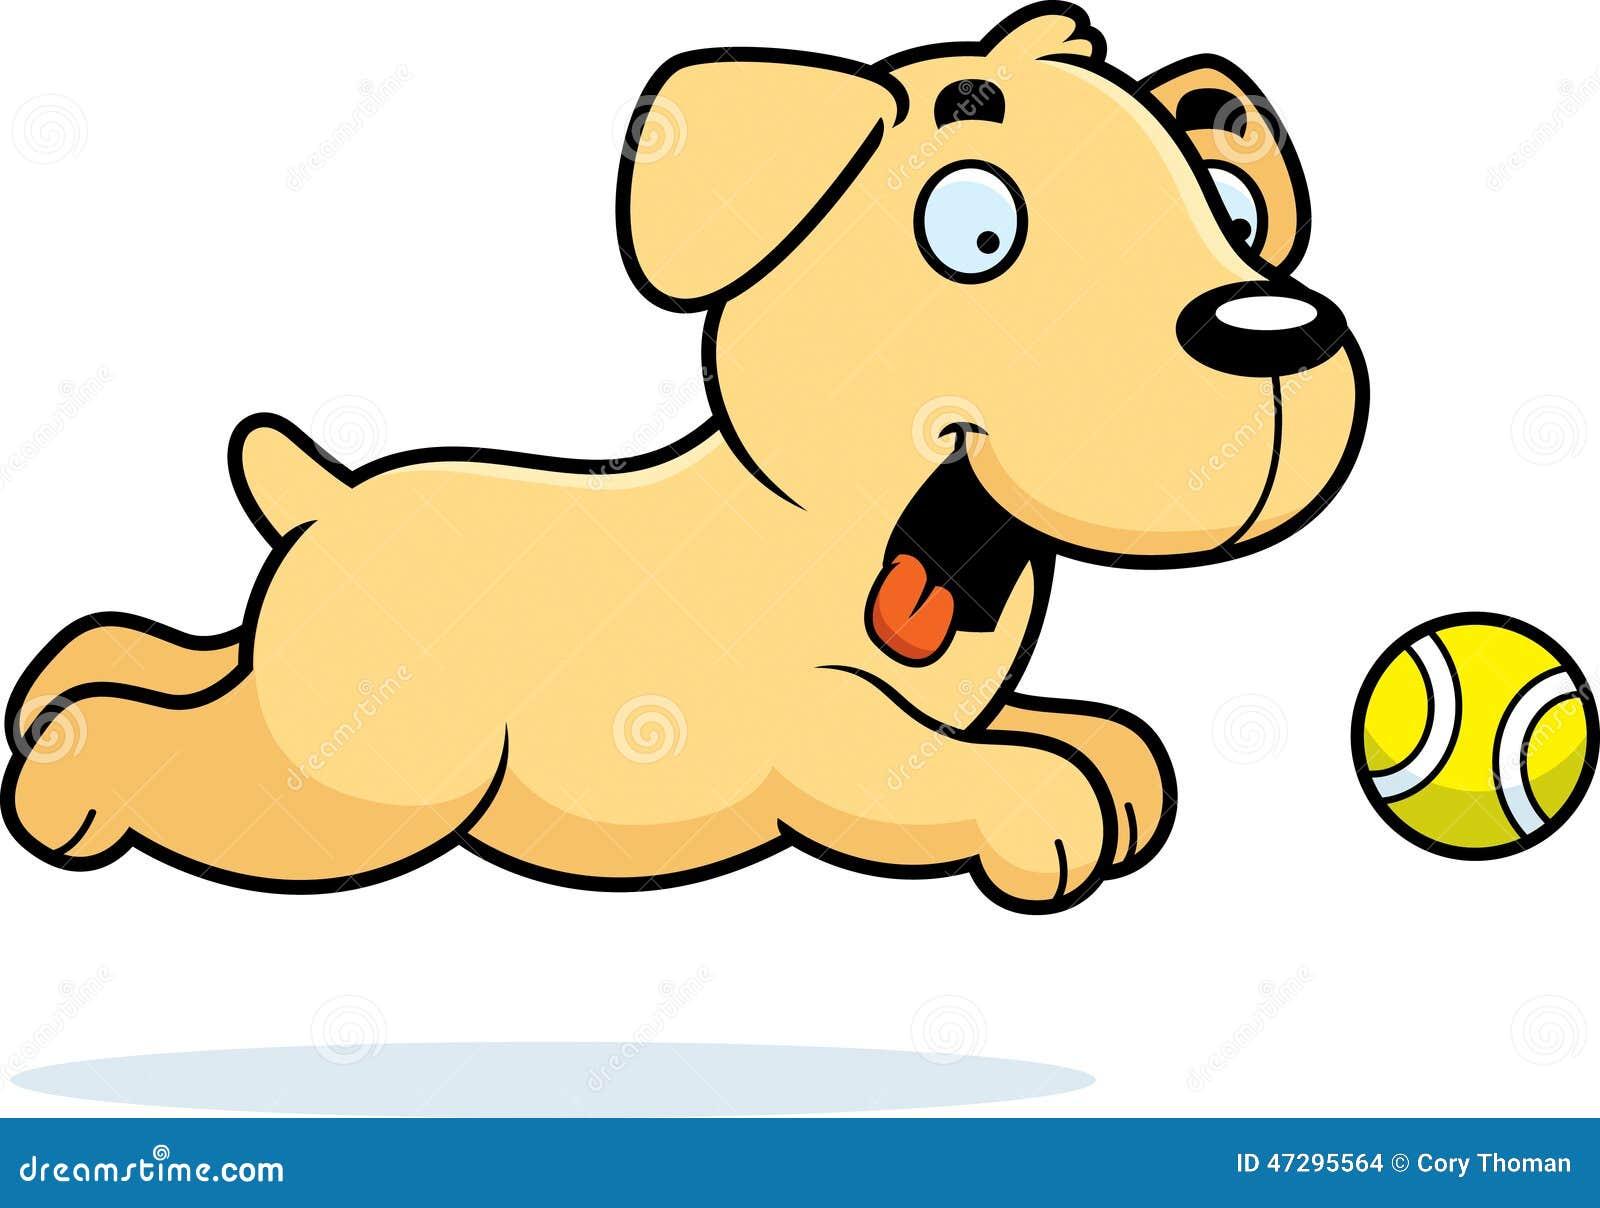 download cartoon labrador chasing ball stock vector illustration of animal tennis 47295564